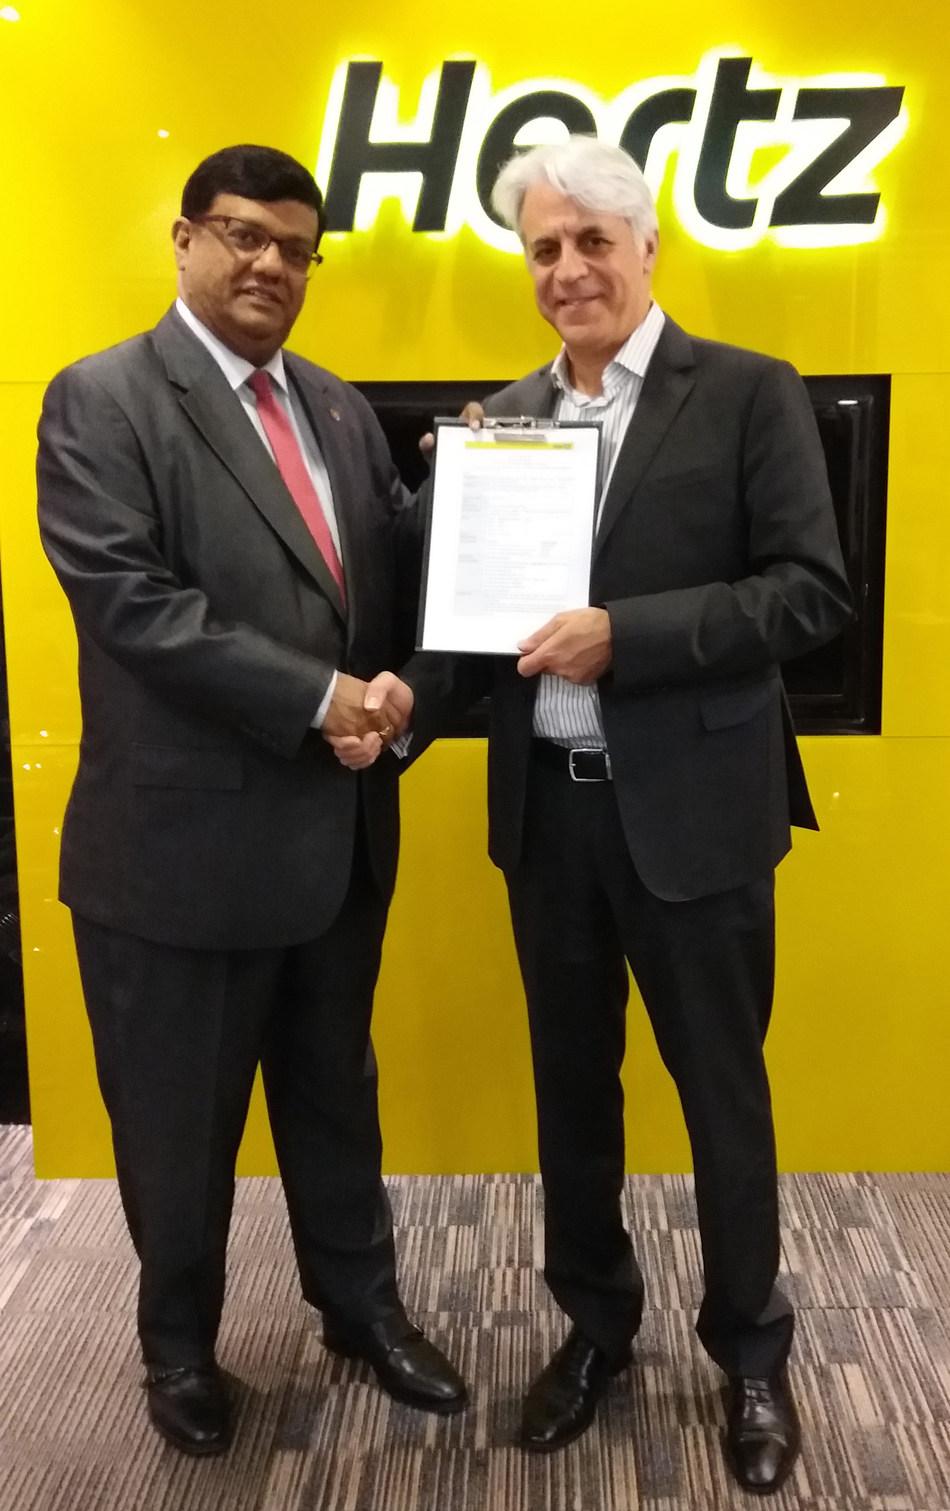 Michel Taride, Group President, Hertz International and Mahen Kariyawasan, Managing Director, Hertz, Dollar and Thrifty Sri Lanka.